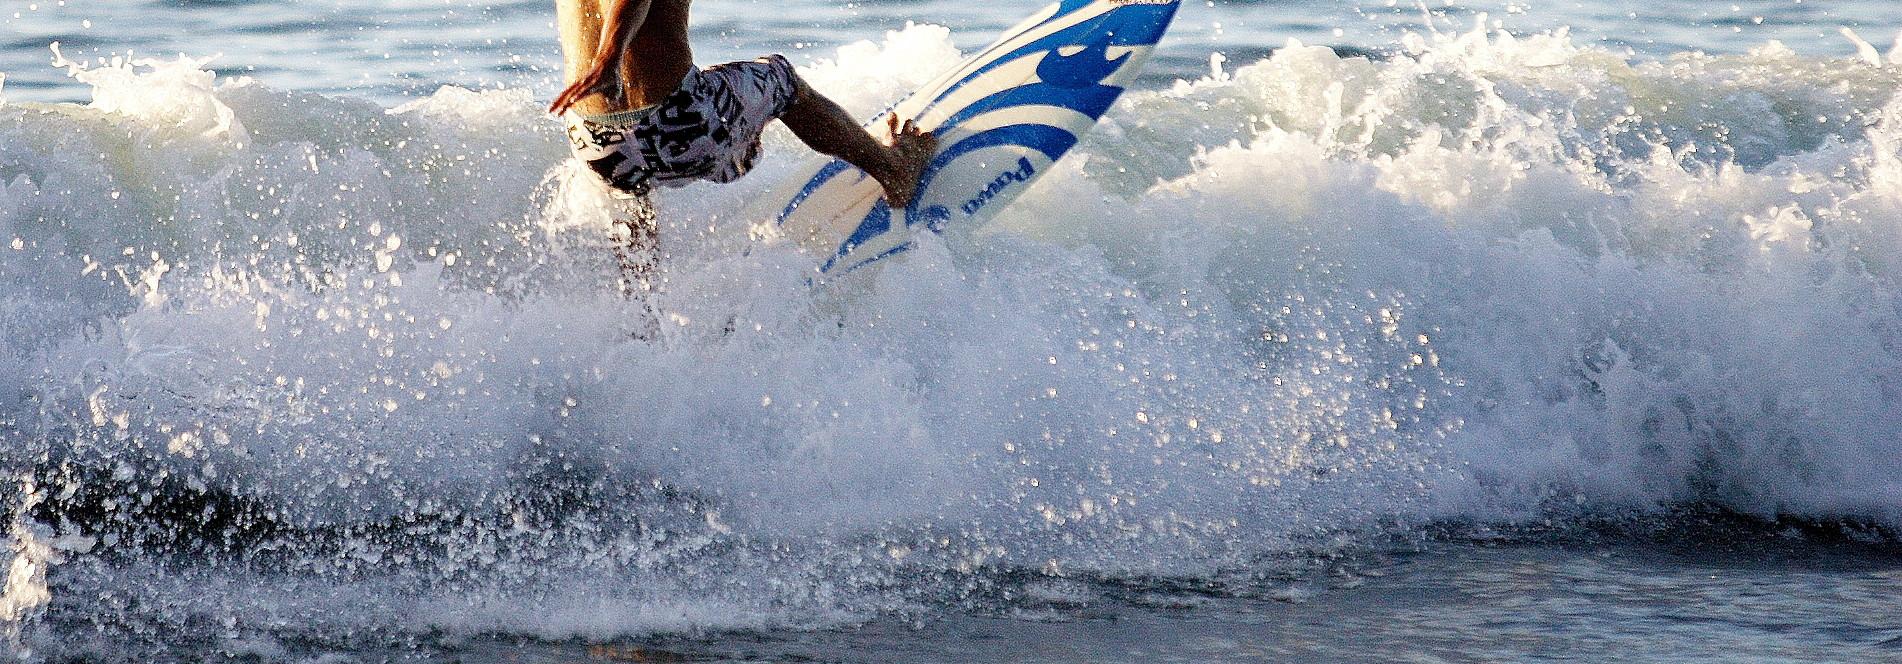 sayulita-surfer